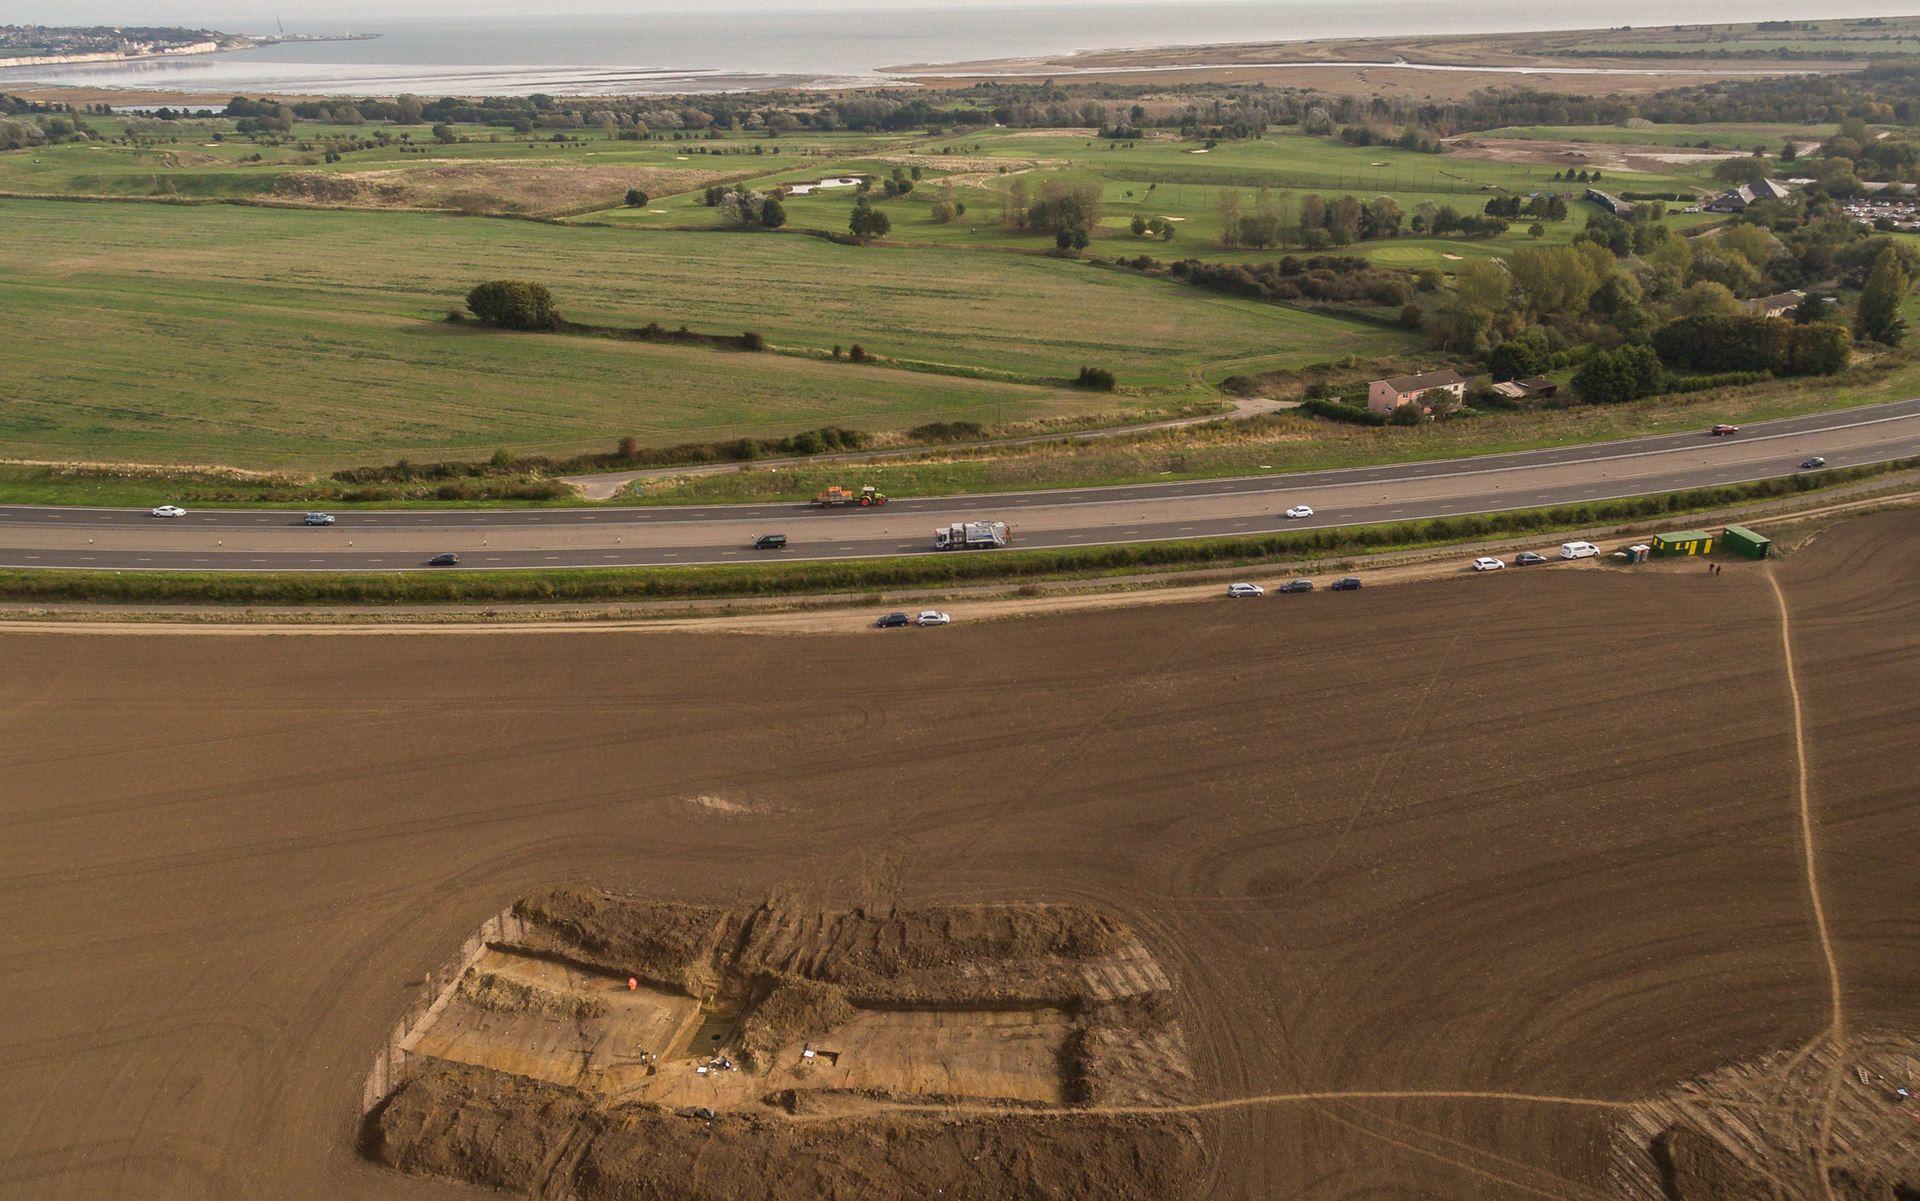 4-Ebbsfleet-excavation-with-Pegwell-Bay-Ramsgate_trans_NvBQzQNjv4BqjZ74xHwVbP0tA0CUaGf3uwhDOFTbUsMHkVDDn2MqFbM